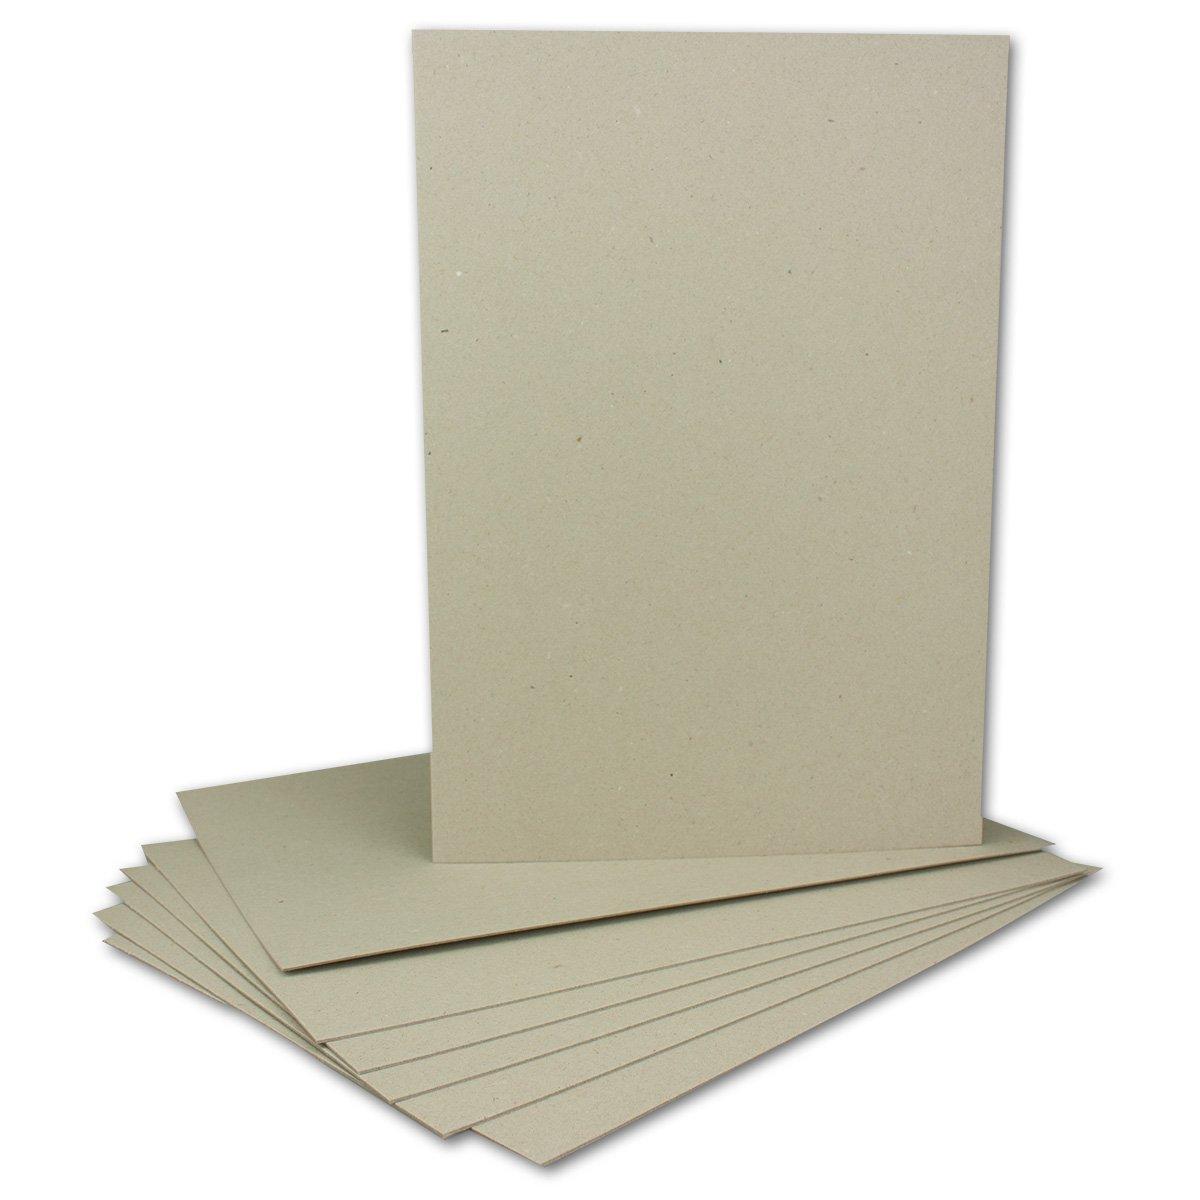 100 Stück Buchbinderpappe DIN A4   Stärke 2,0 mm   Grammatur  1230 g m²   Format  29,7 x 21,0 cm   Farbe  Grau-Braun   100 Stück B072XPFRTL | Marke